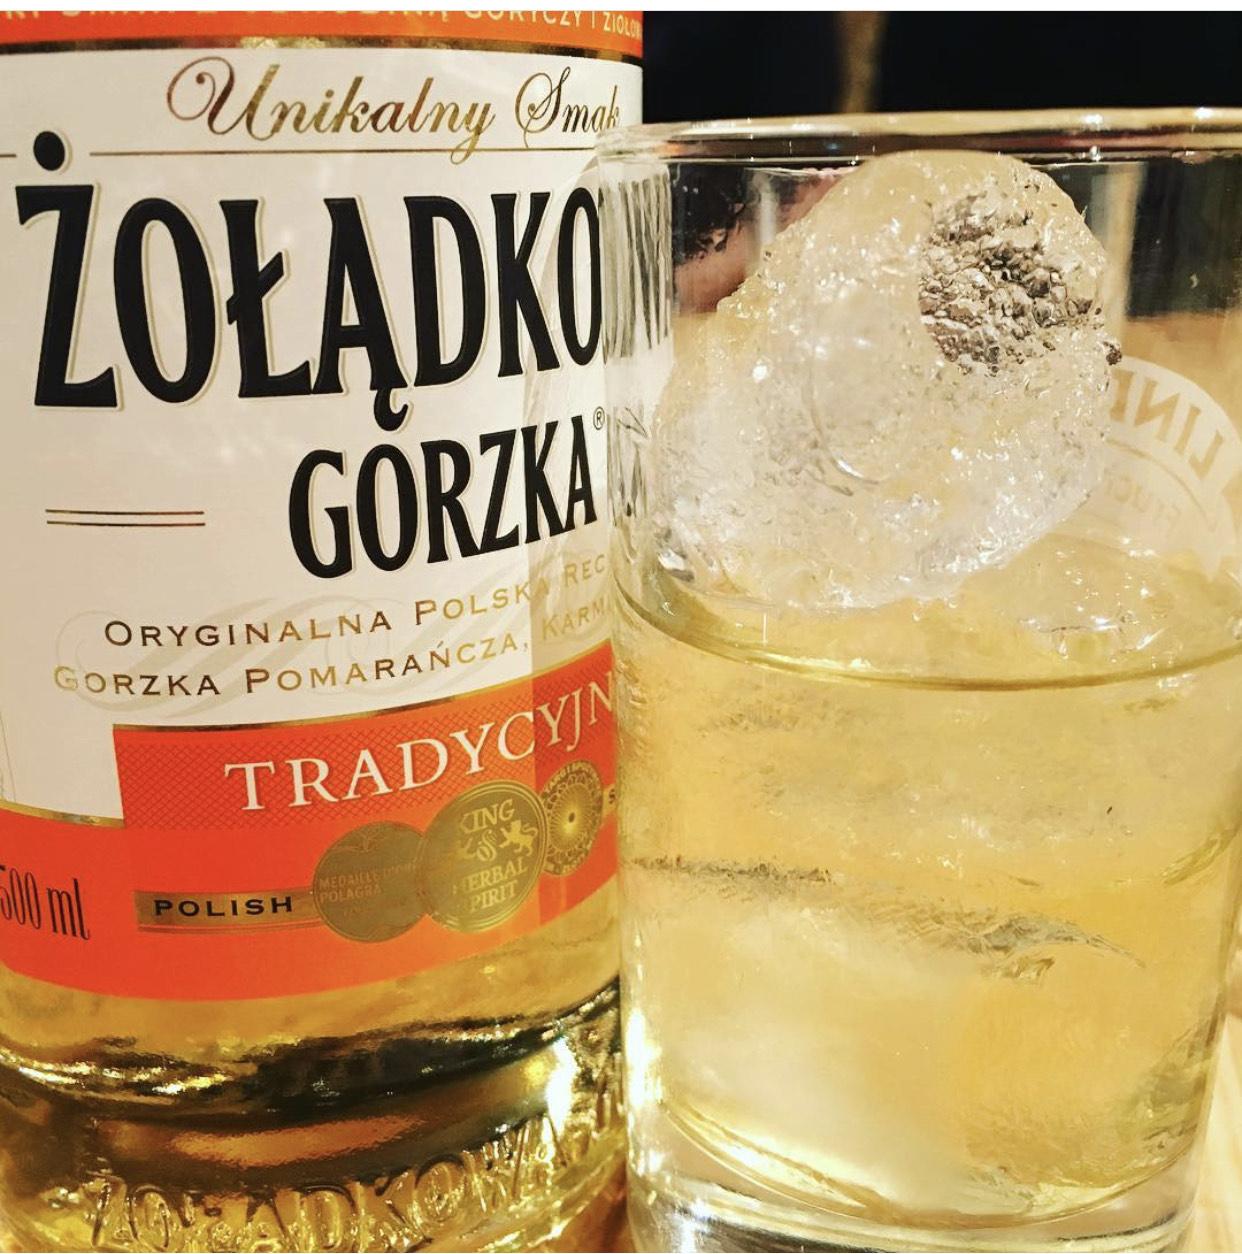 [Penny]Zoladkowa Gorzka polnischer Vodka / Likörchen Traditional 0.5l für 5.99€ | poln. Pierogi für 1.99€